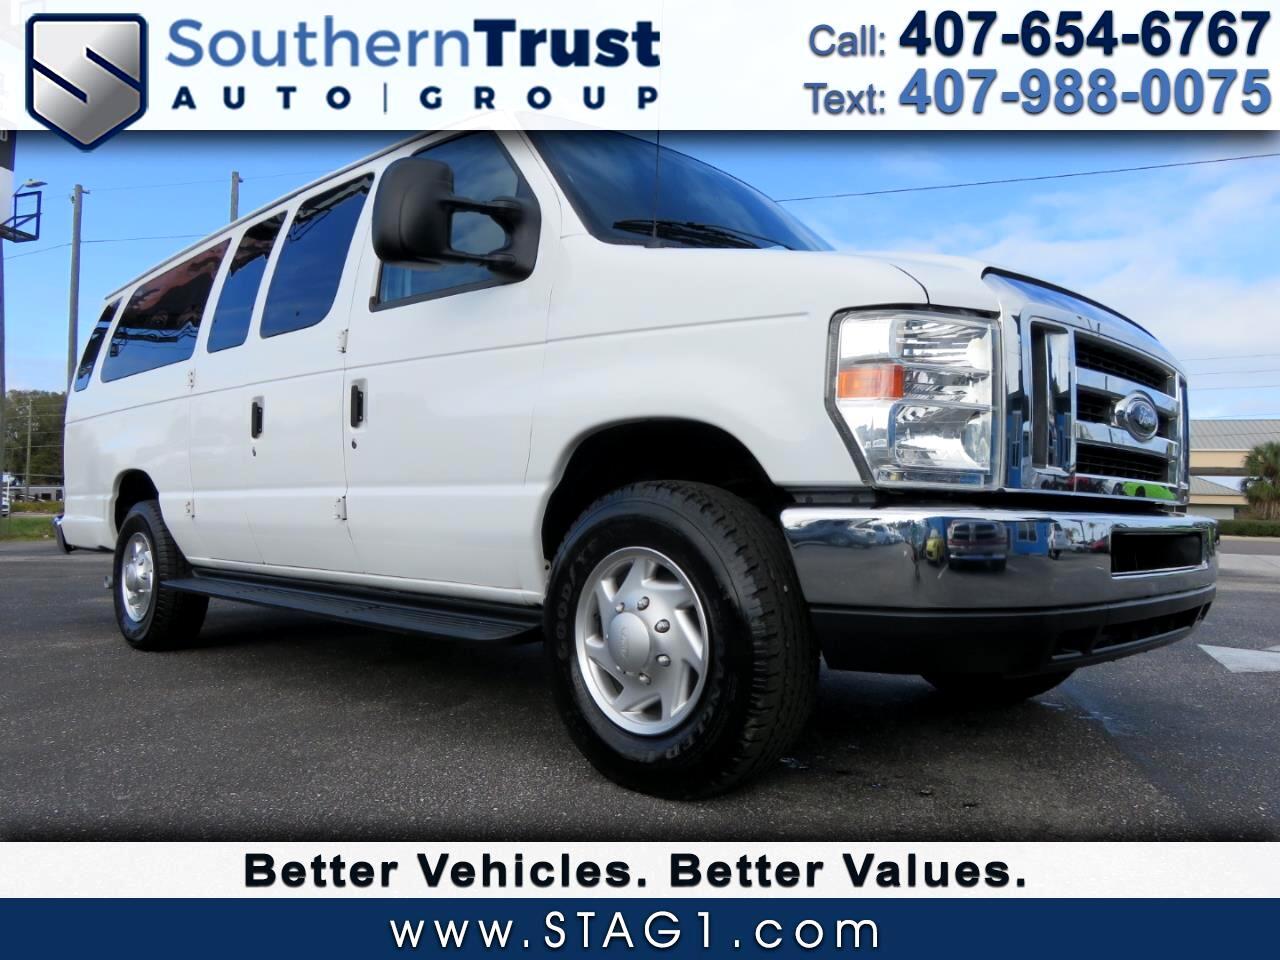 Ford Econoline Wagon E-350 Super Duty Ext XLT 2012